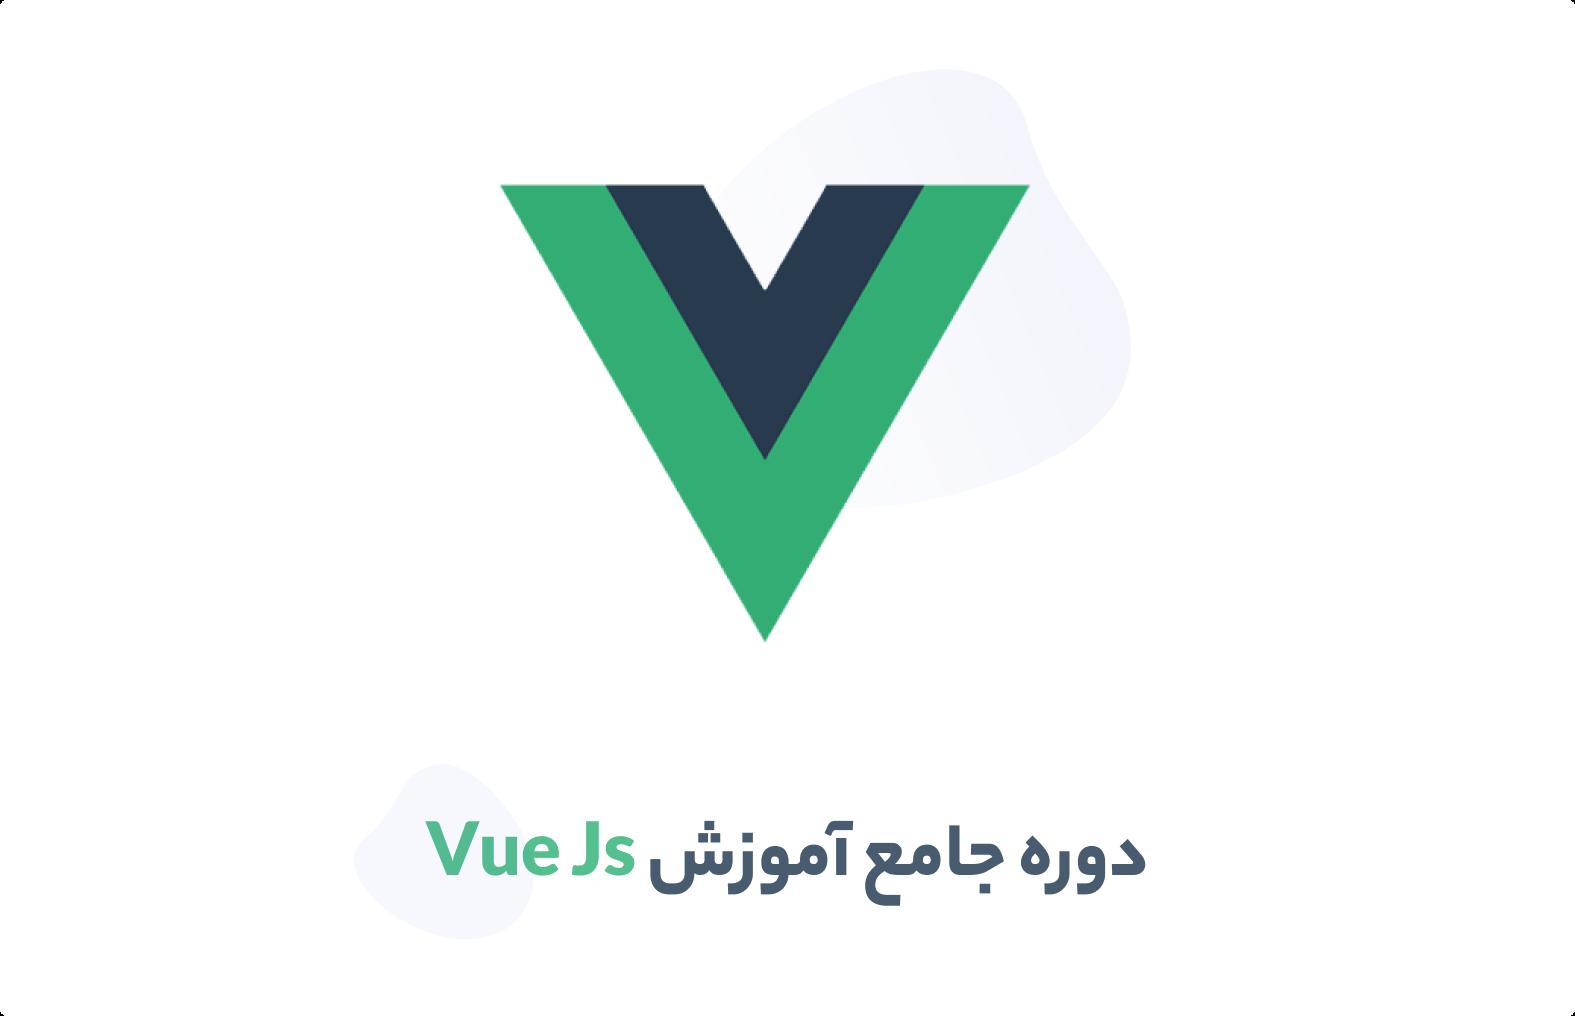 دوره جامع آموزش Vue Js | پروژه محور و کاربردی